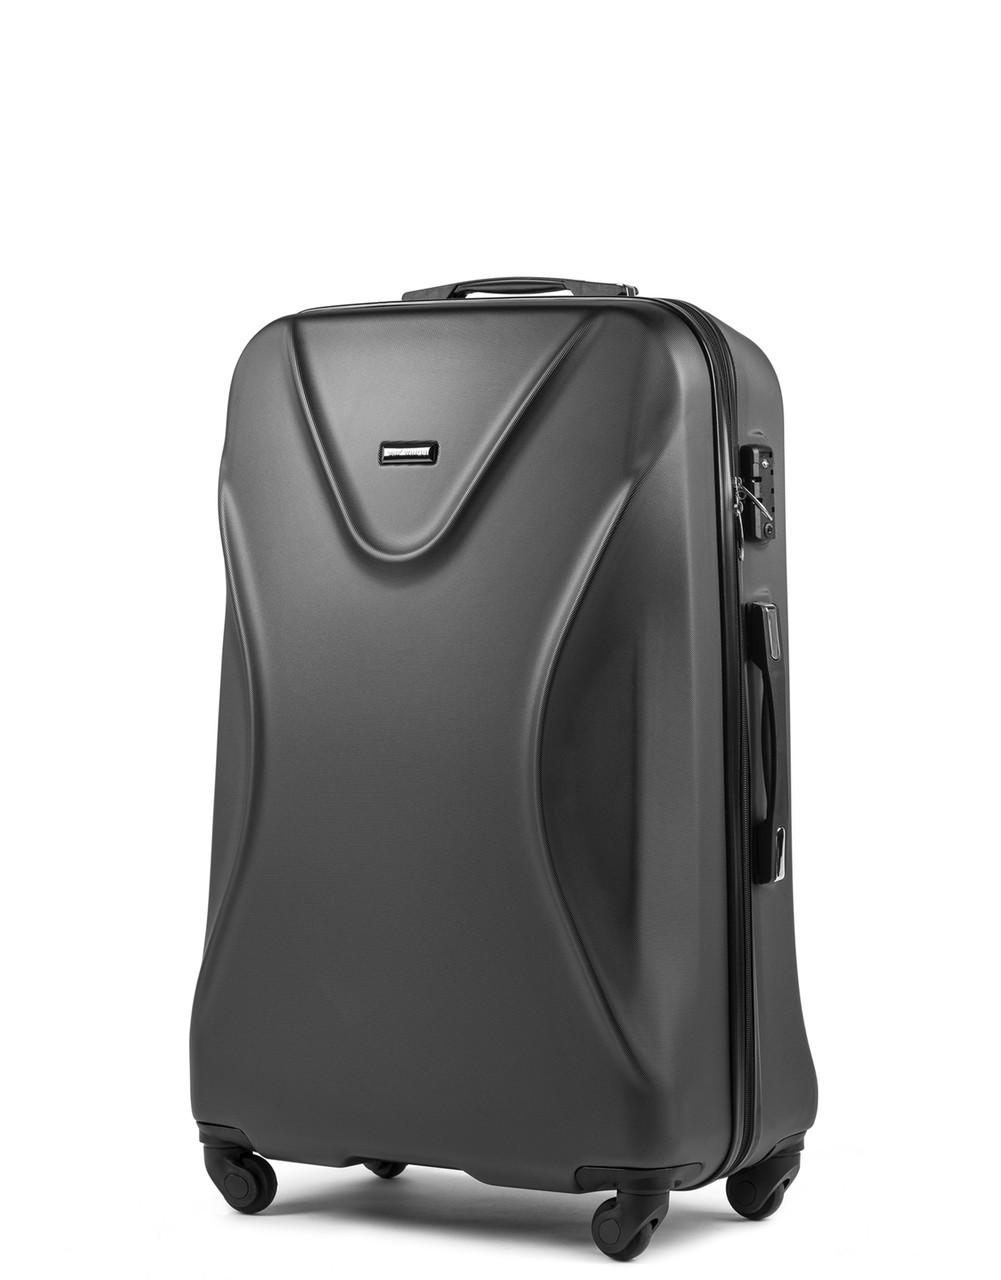 Малый пластиковый чемодан Wings 518 на 4 колесах серый